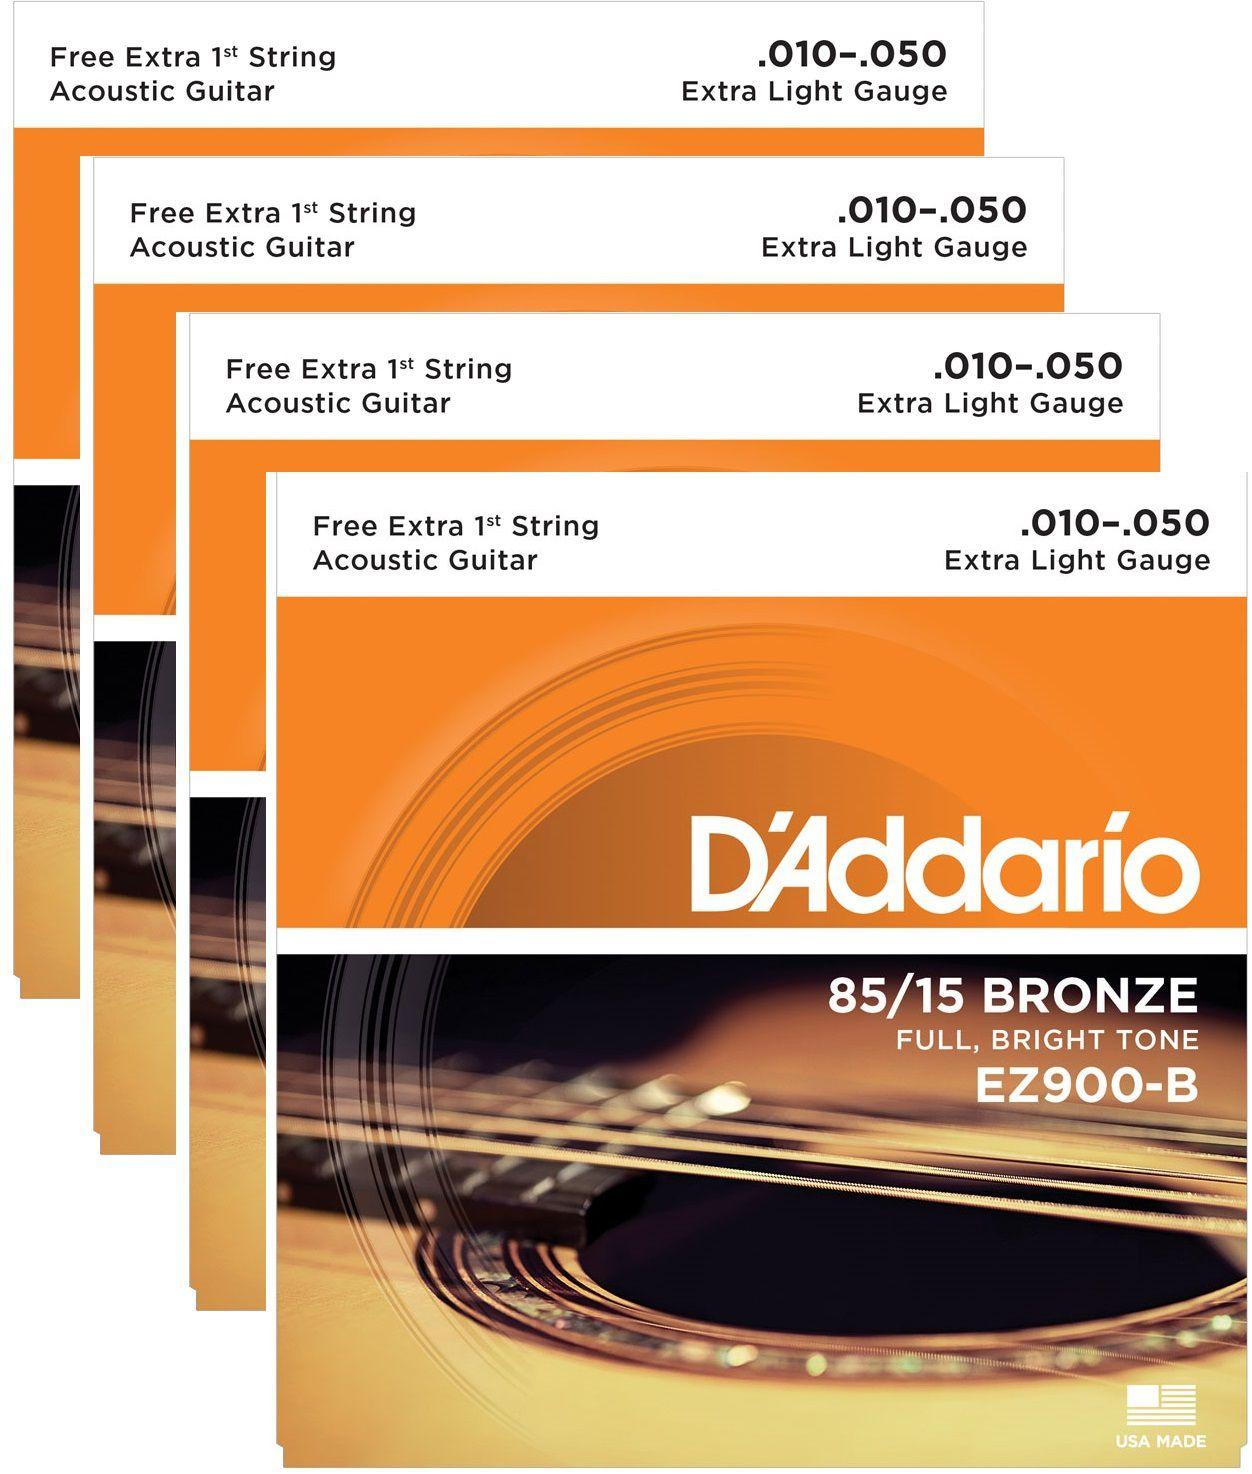 Kit 4 Encordoamento Cordas Daddario Violão Aço Ez900 010